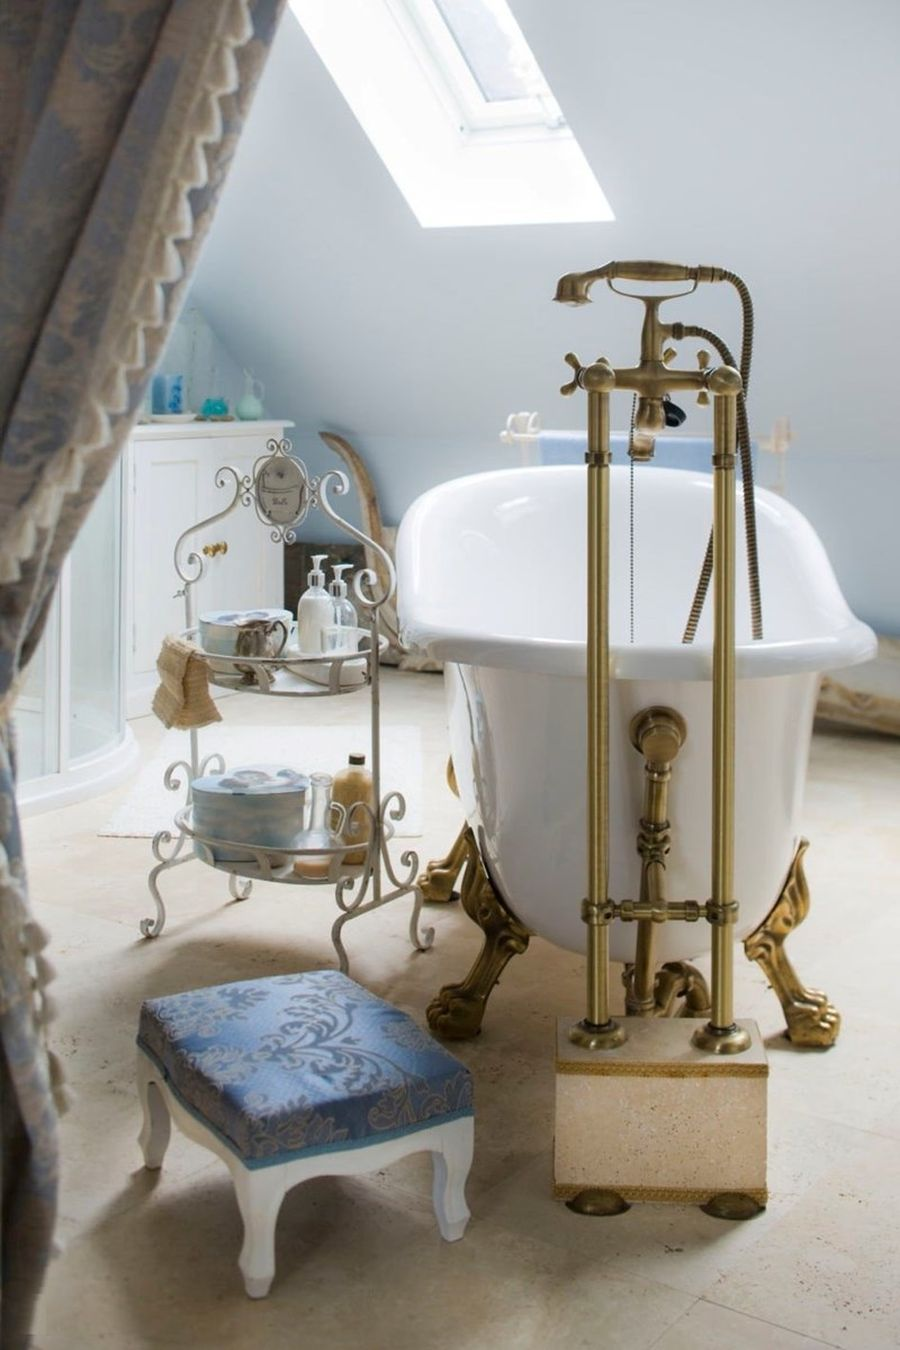 adelaparvu.com despre mansarda romantica, stil rustic, Design PrzepisnaDom, Foto Rafal Lipski (9)